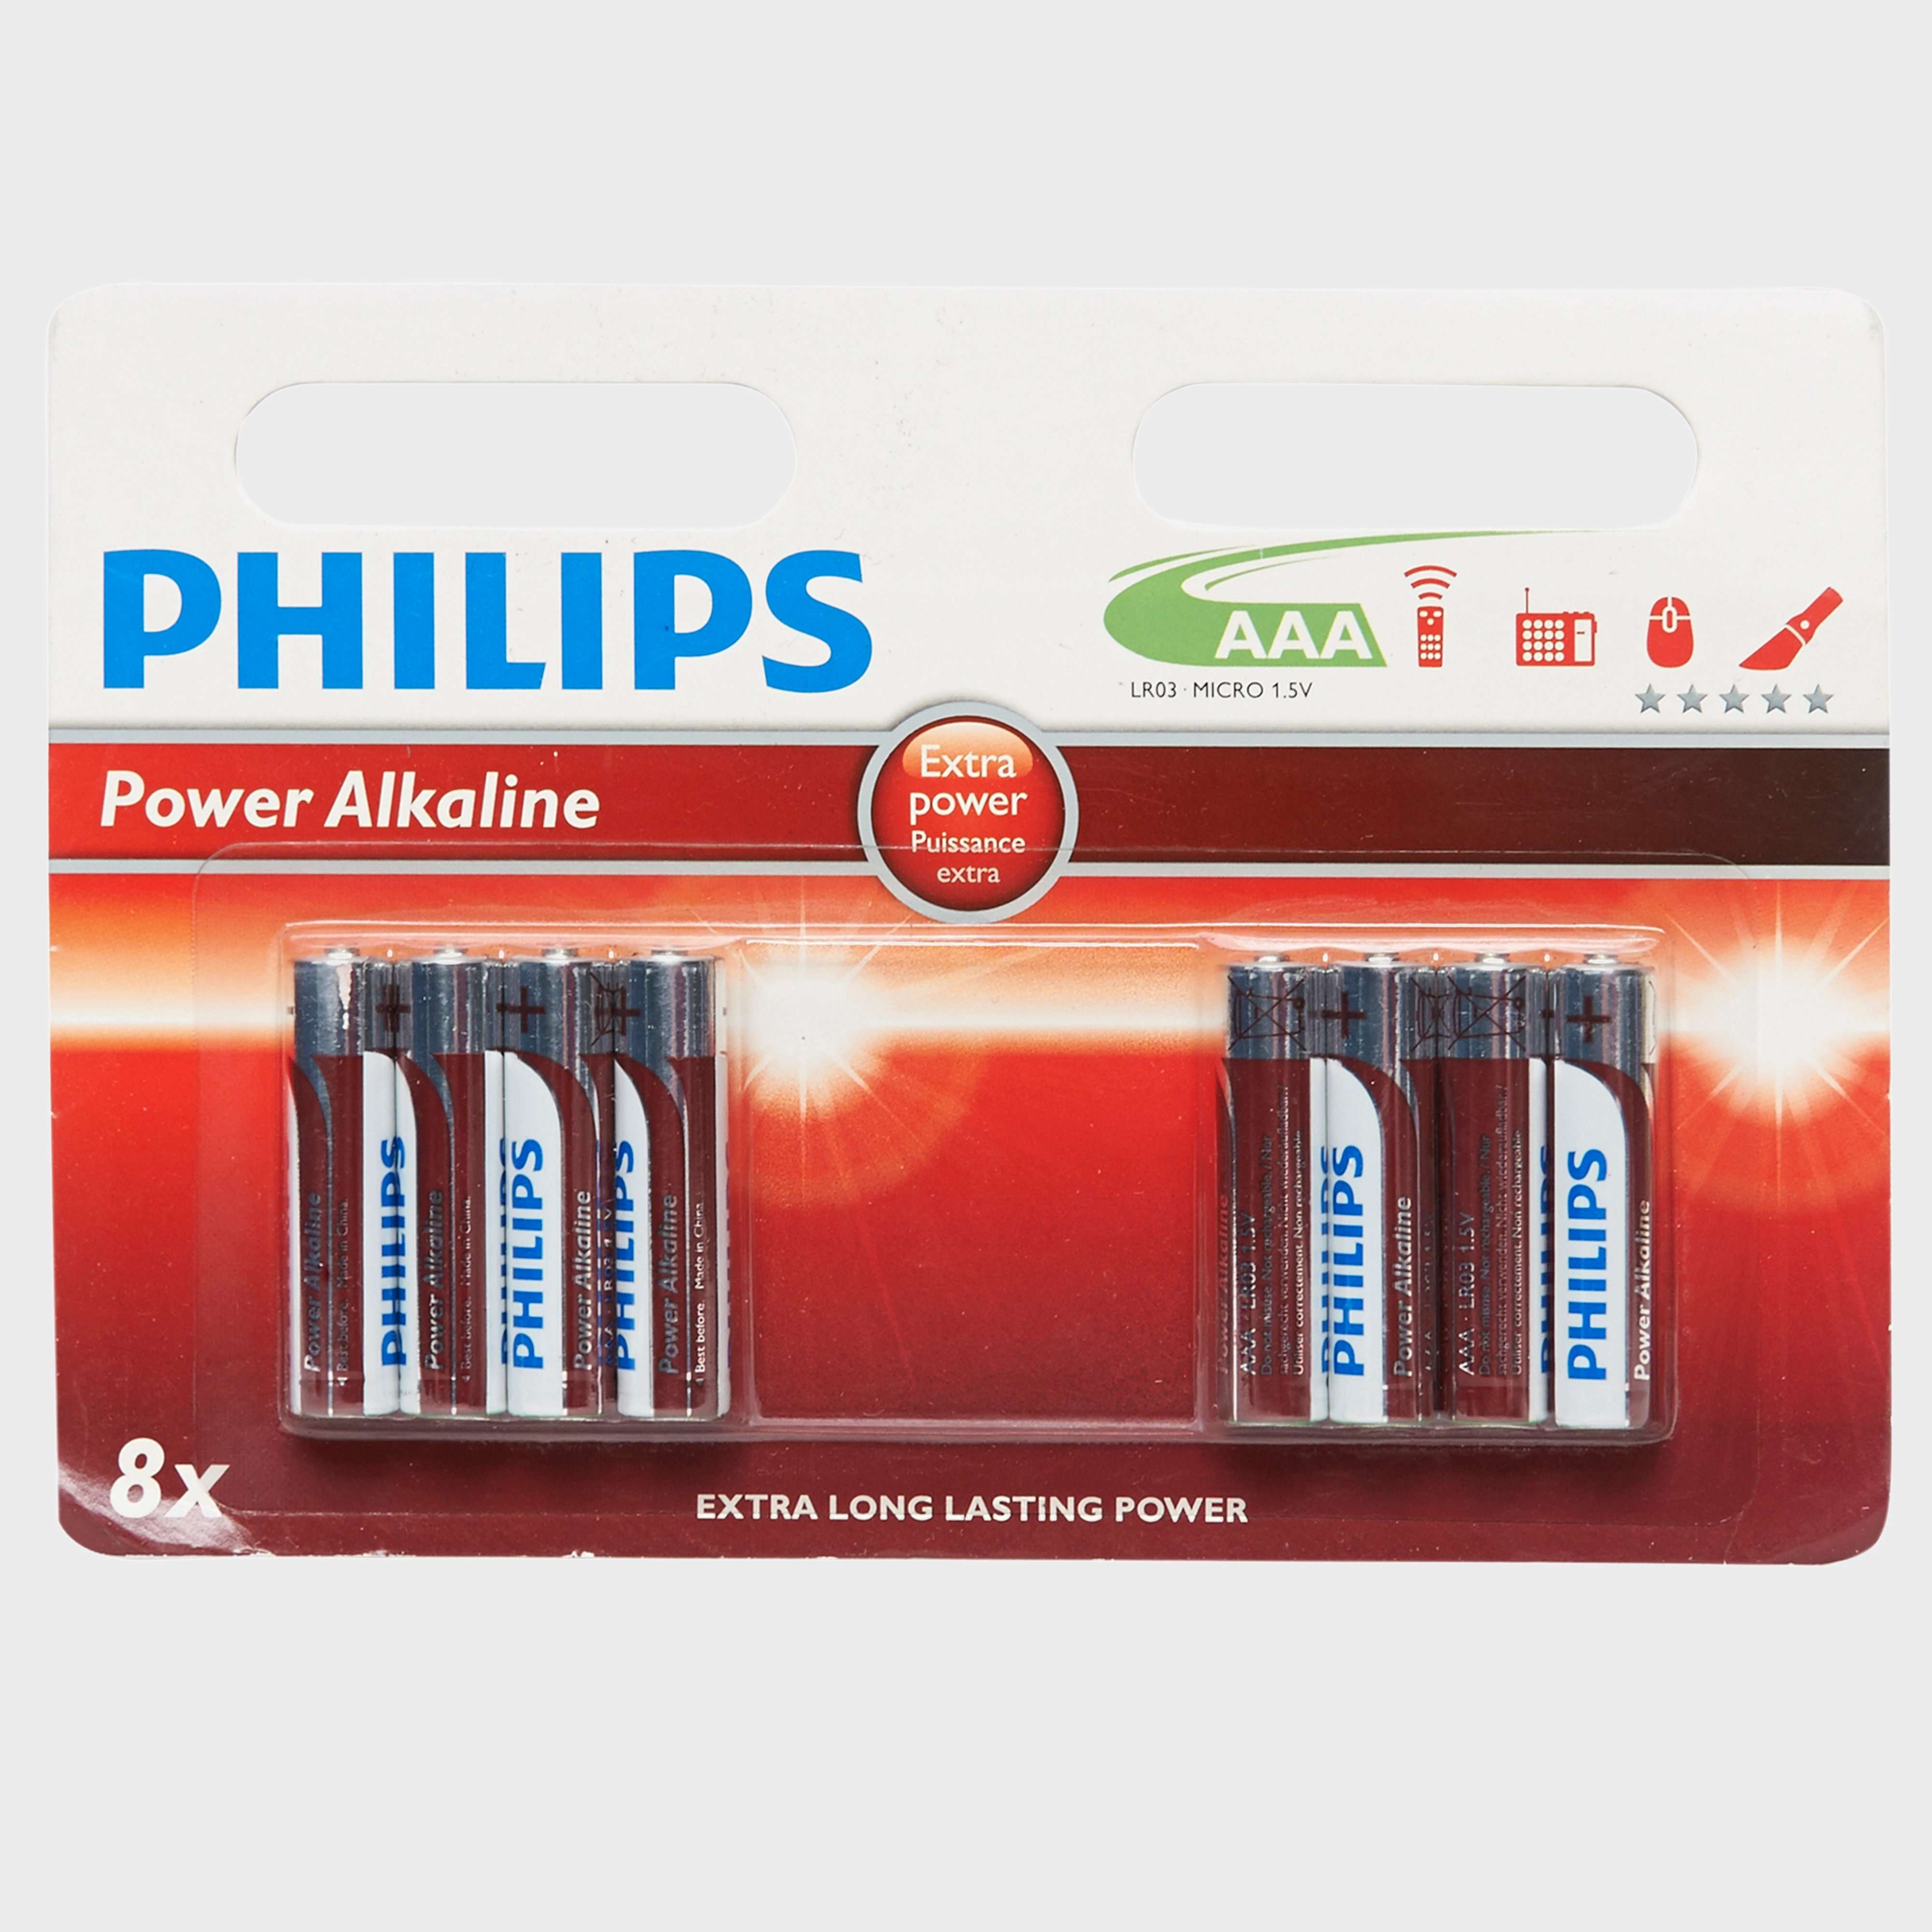 PHILLIPS Ultra Alkaline AAA LR03 Batteries 8 Pack